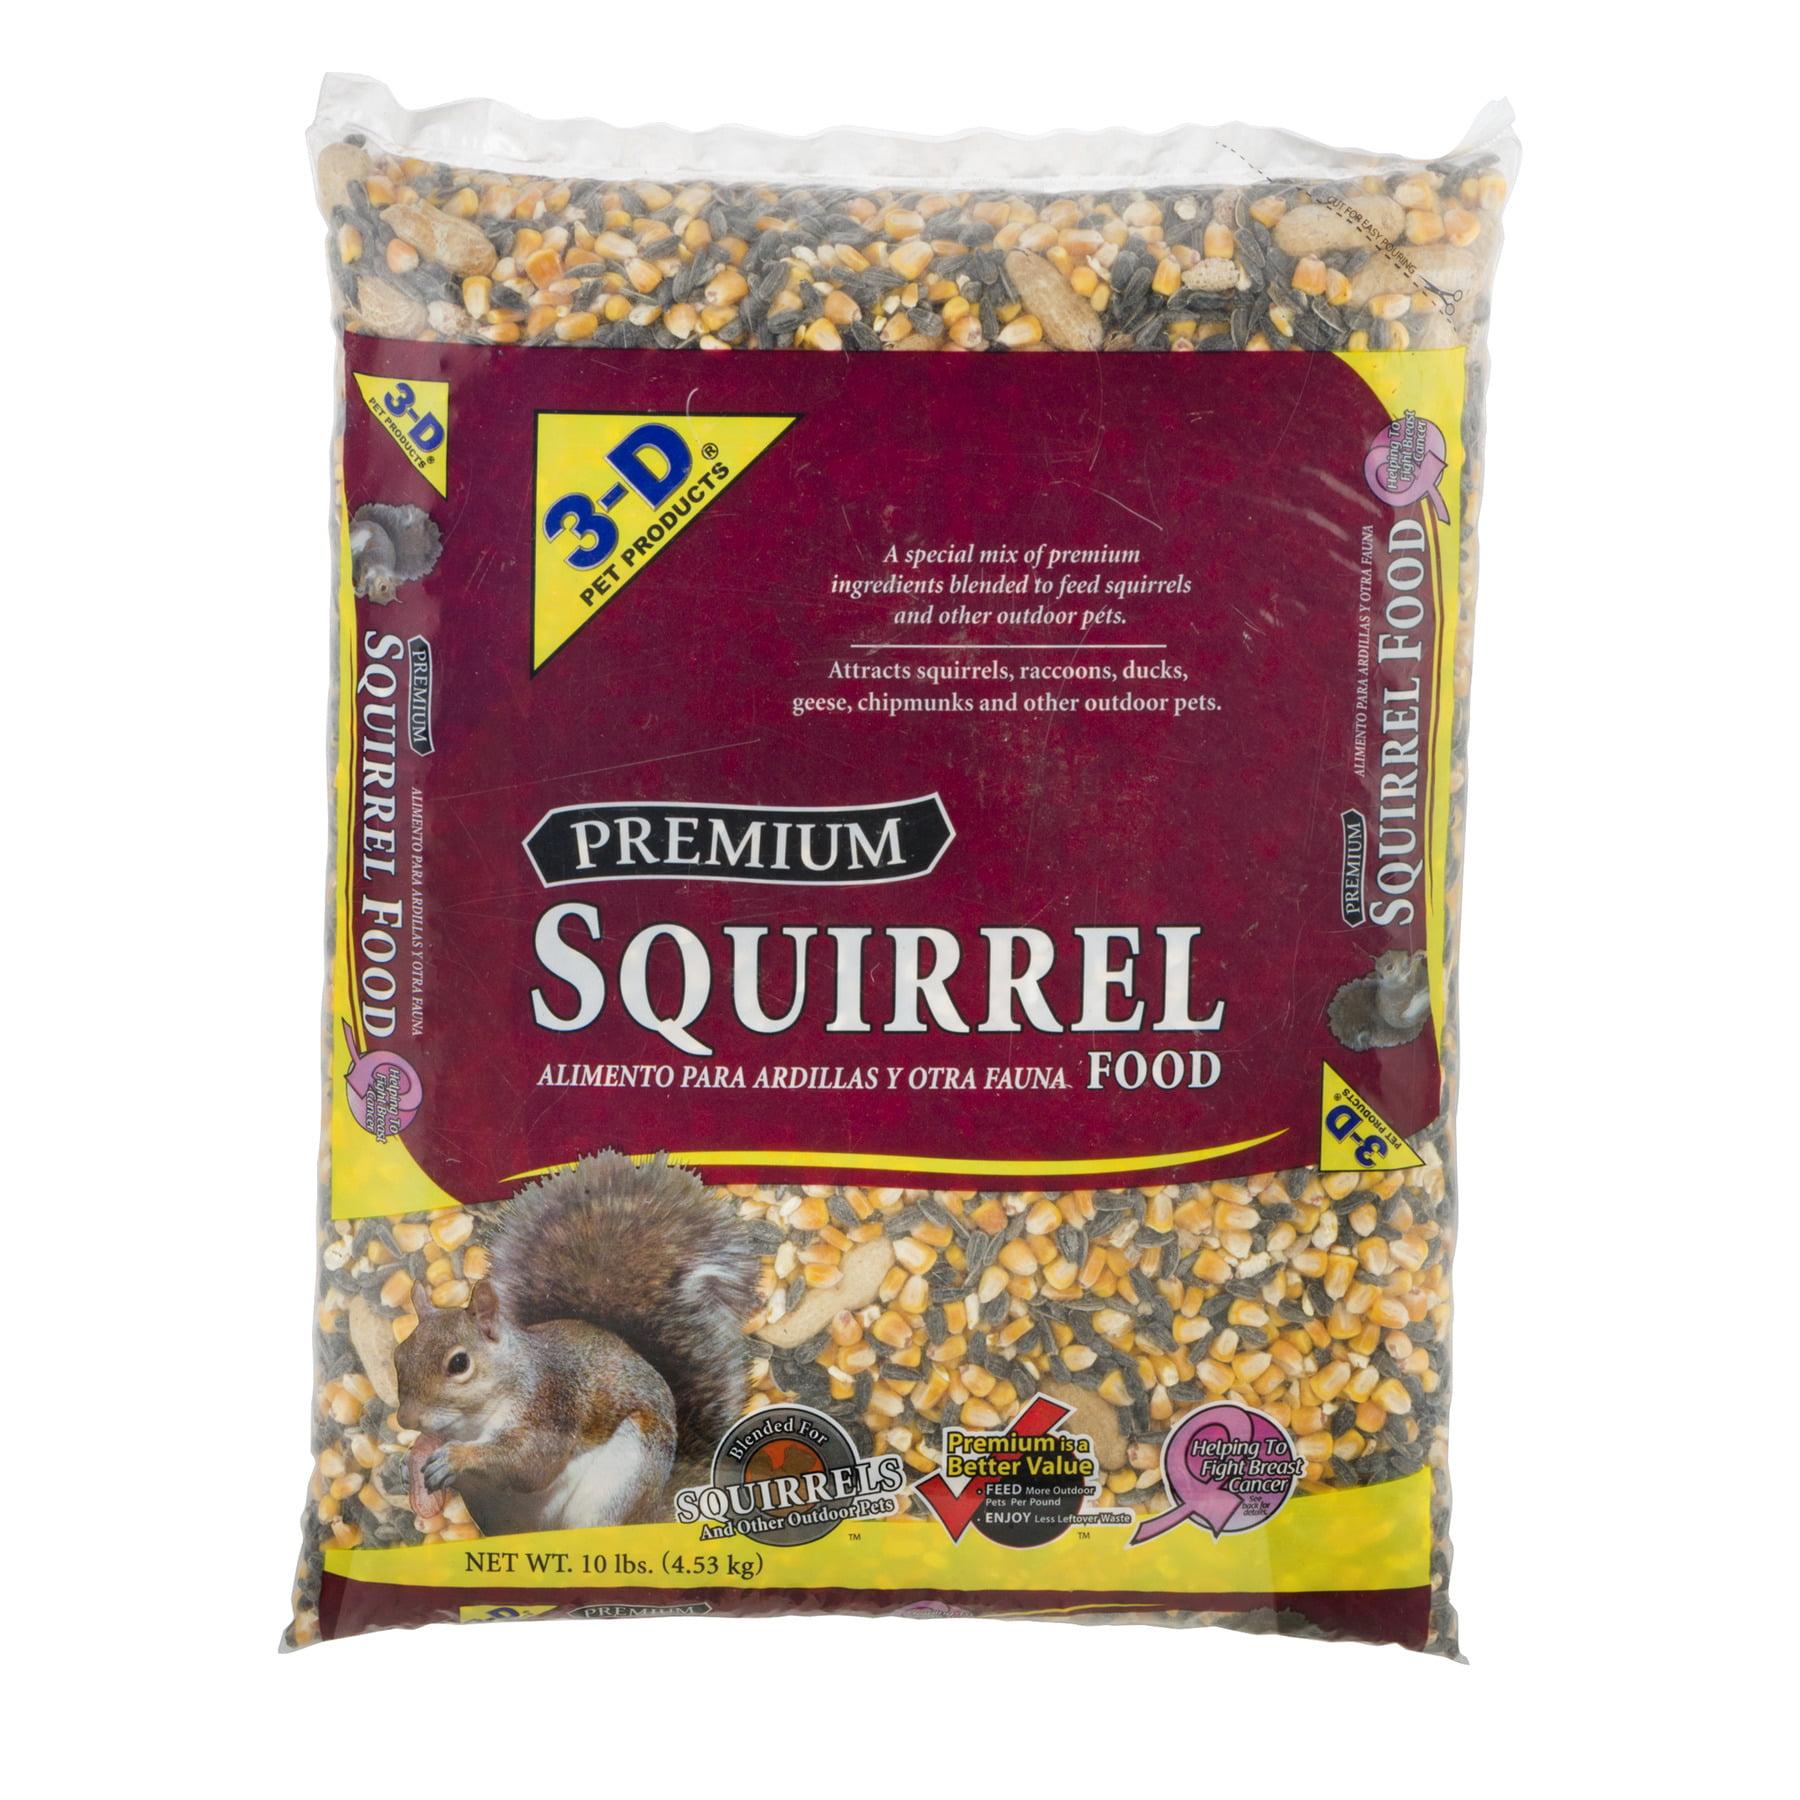 Image of 3-D Pet Products Premium Squirrel Food Dry Squirrel Food, 10 LB